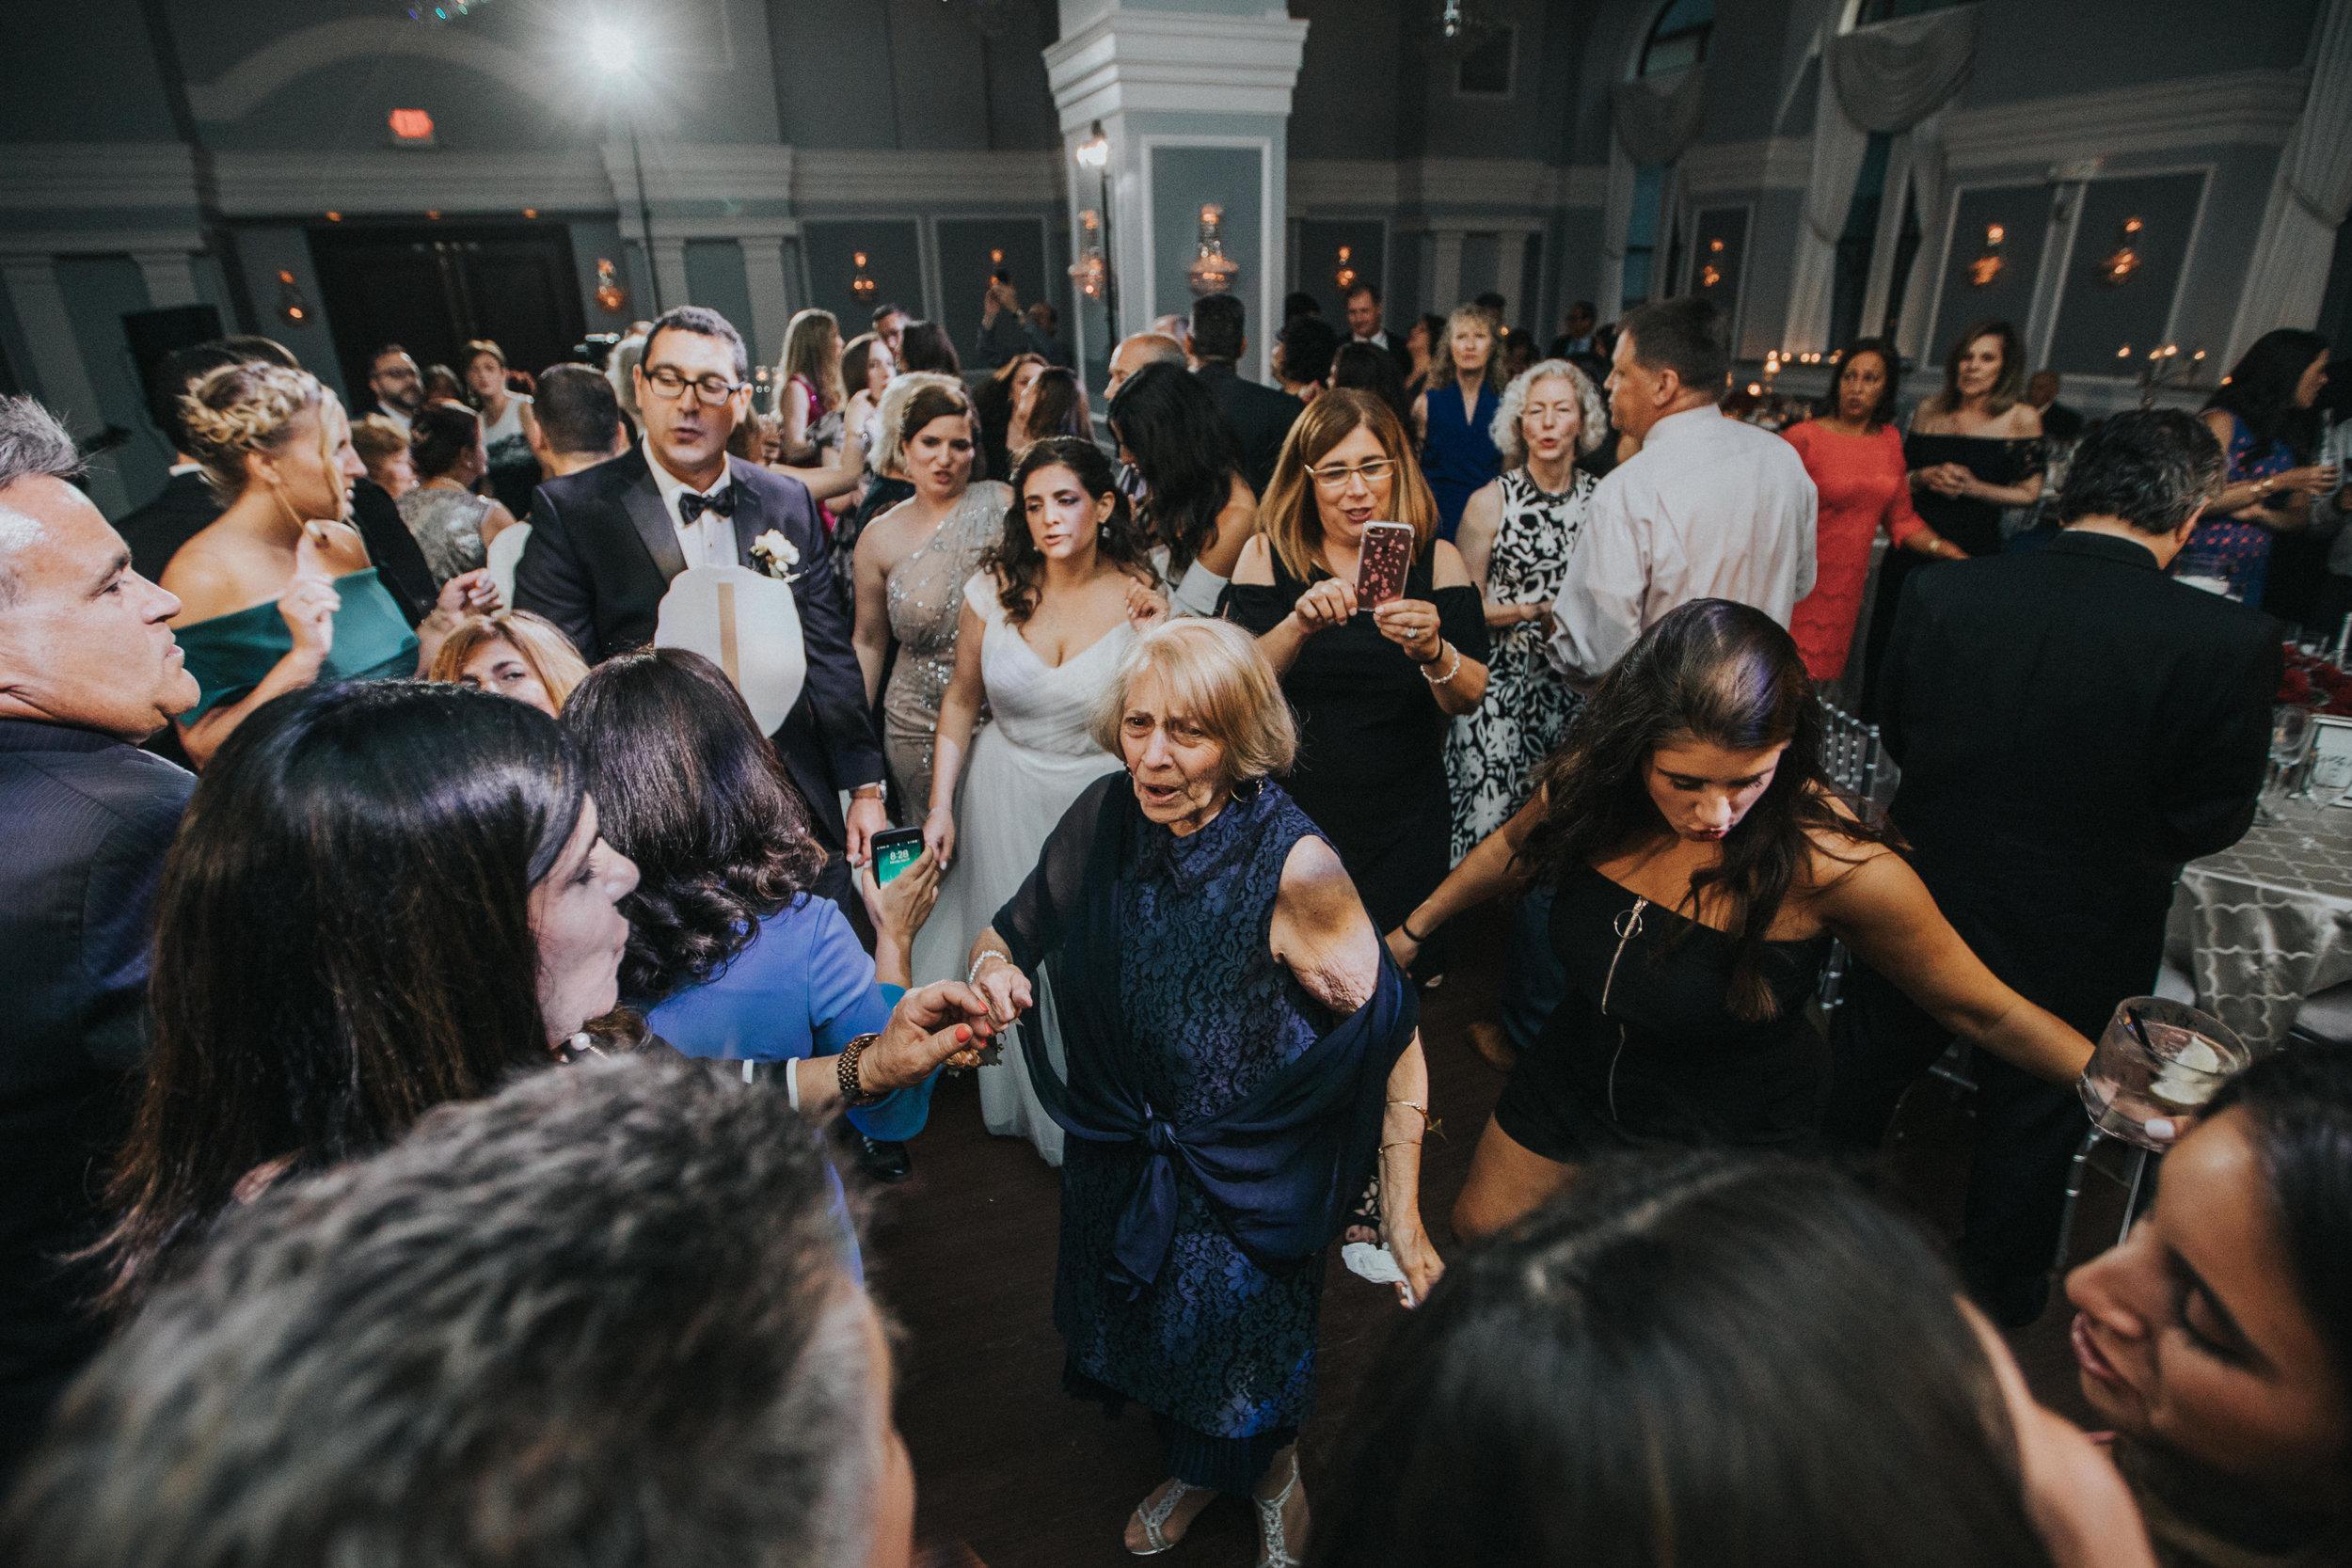 JennaLynnPhotography-NJWeddingPhotographer-Philadelphia-Wedding-ArtsBallroom-Reception-158.jpg